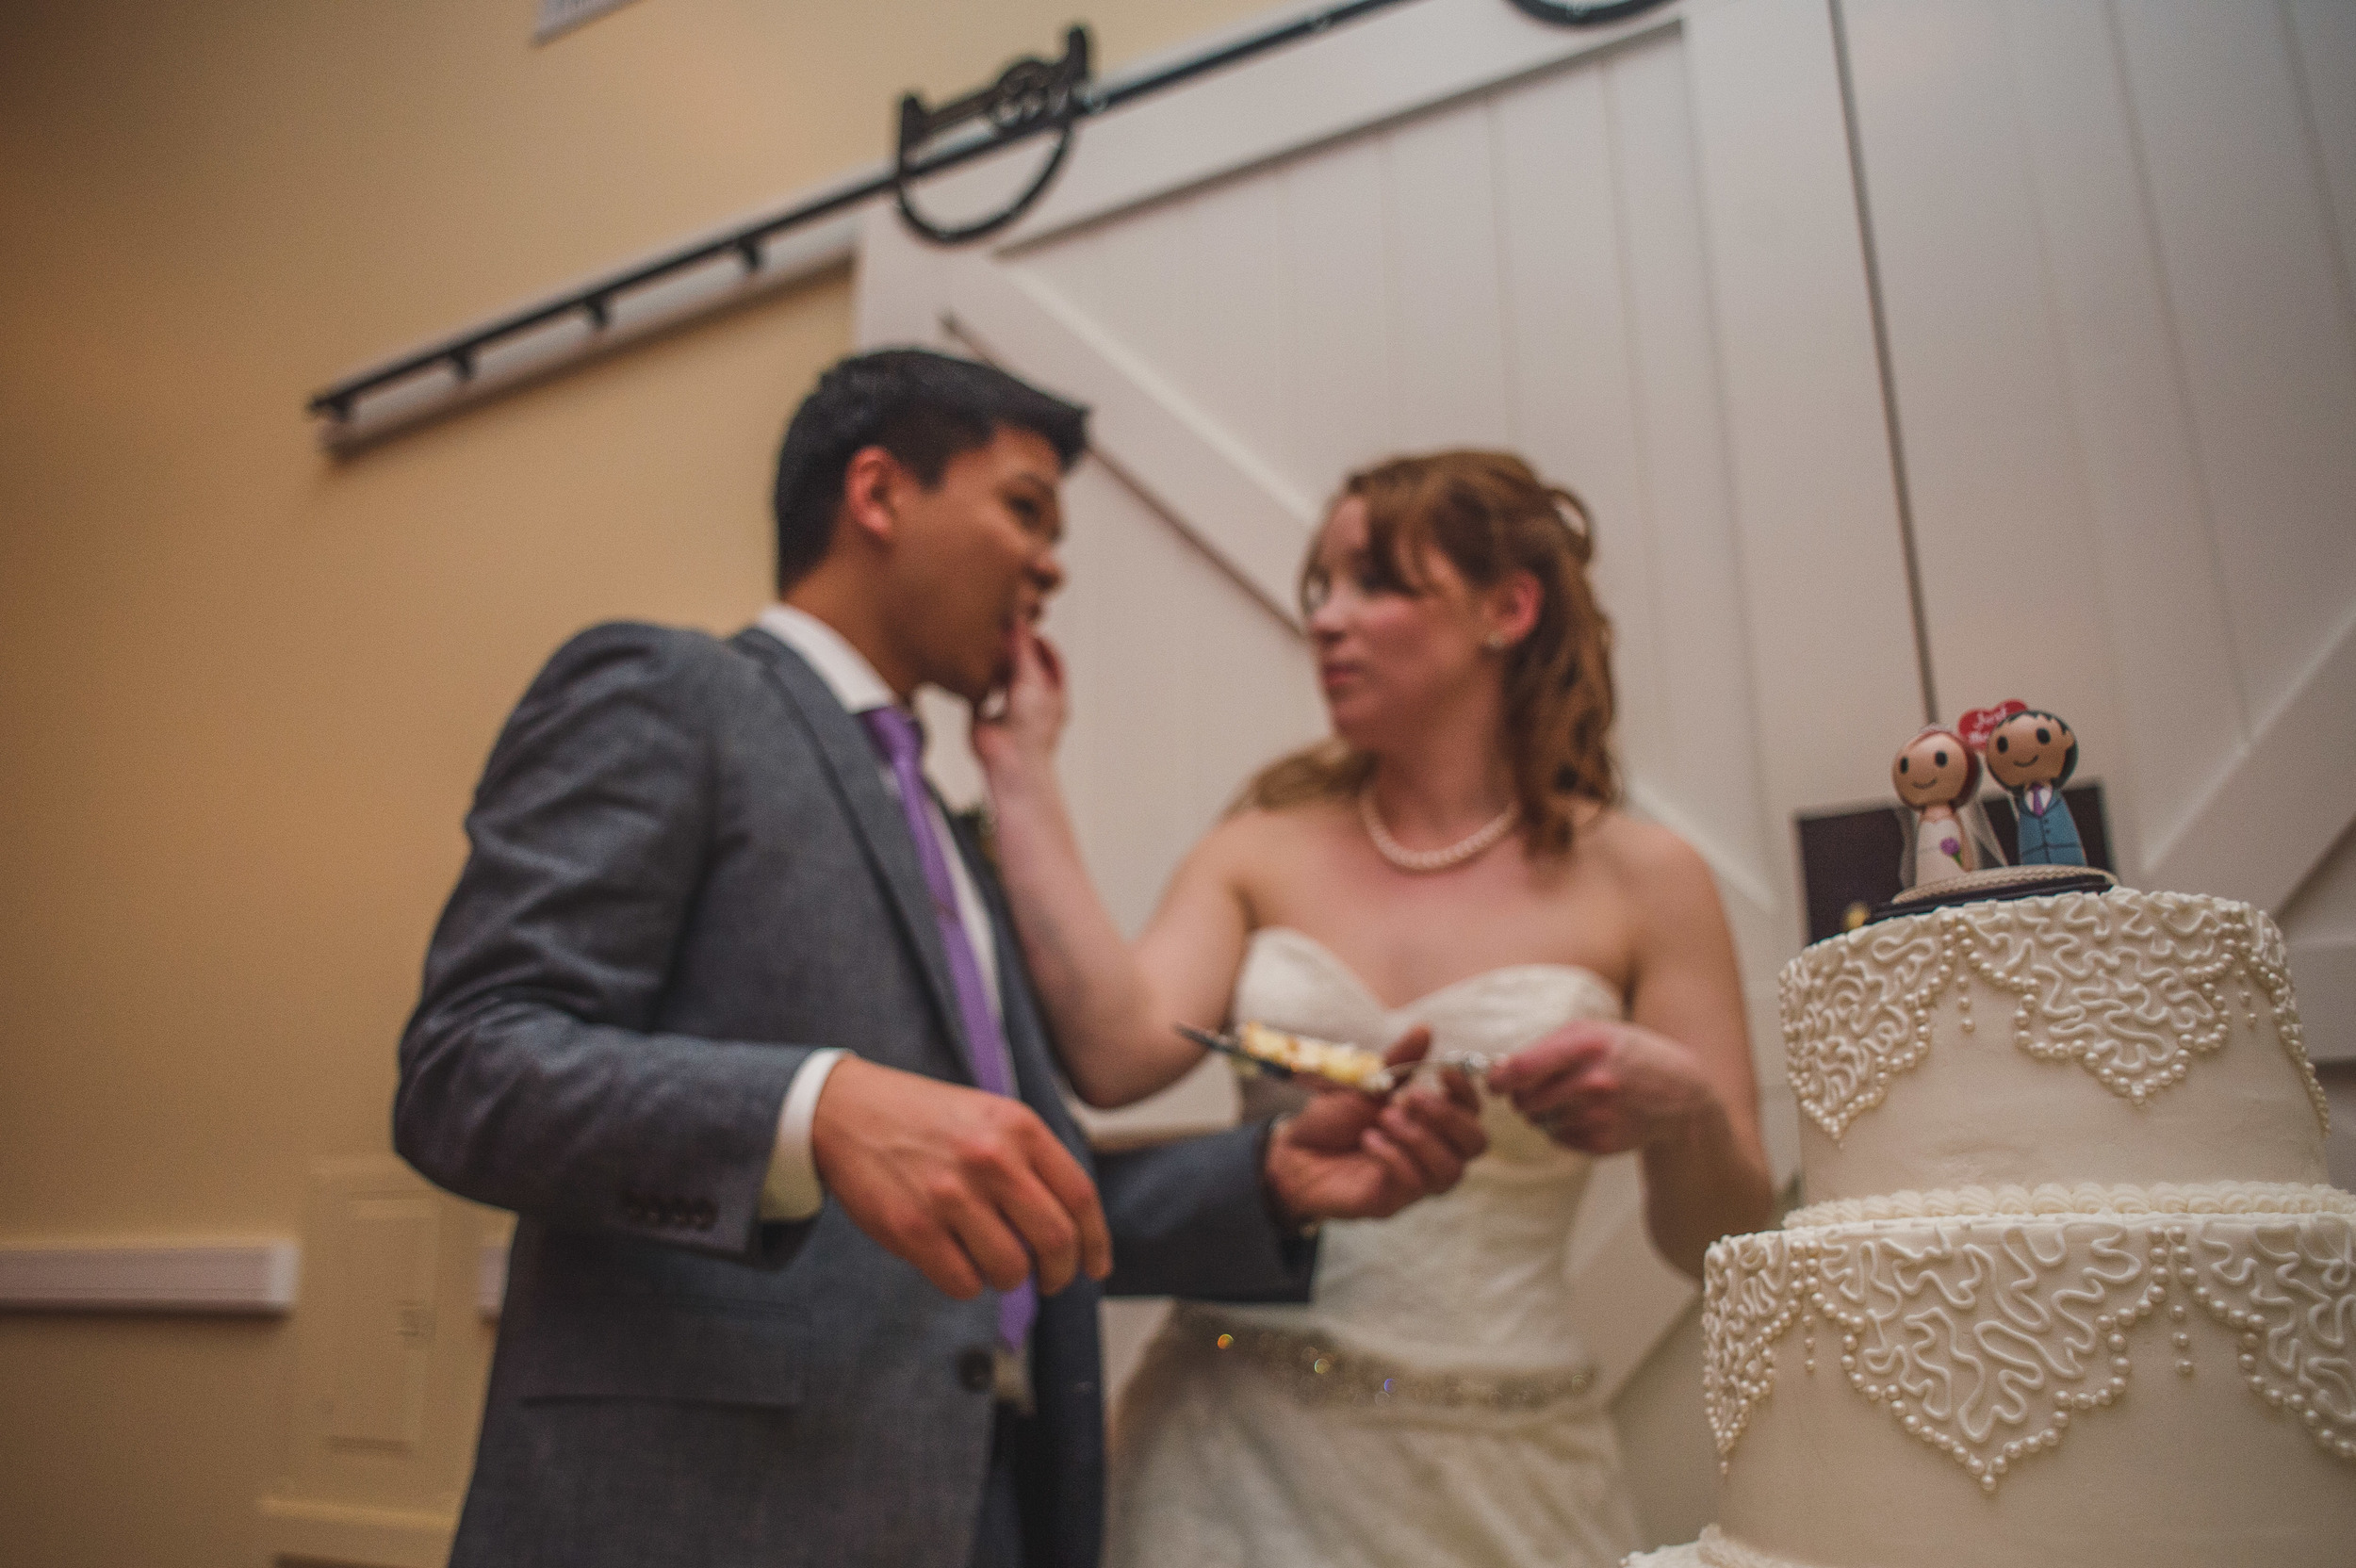 Photojournalistic wedding photography Baltimore MD By Mantas Kubilinskas-52.jpg